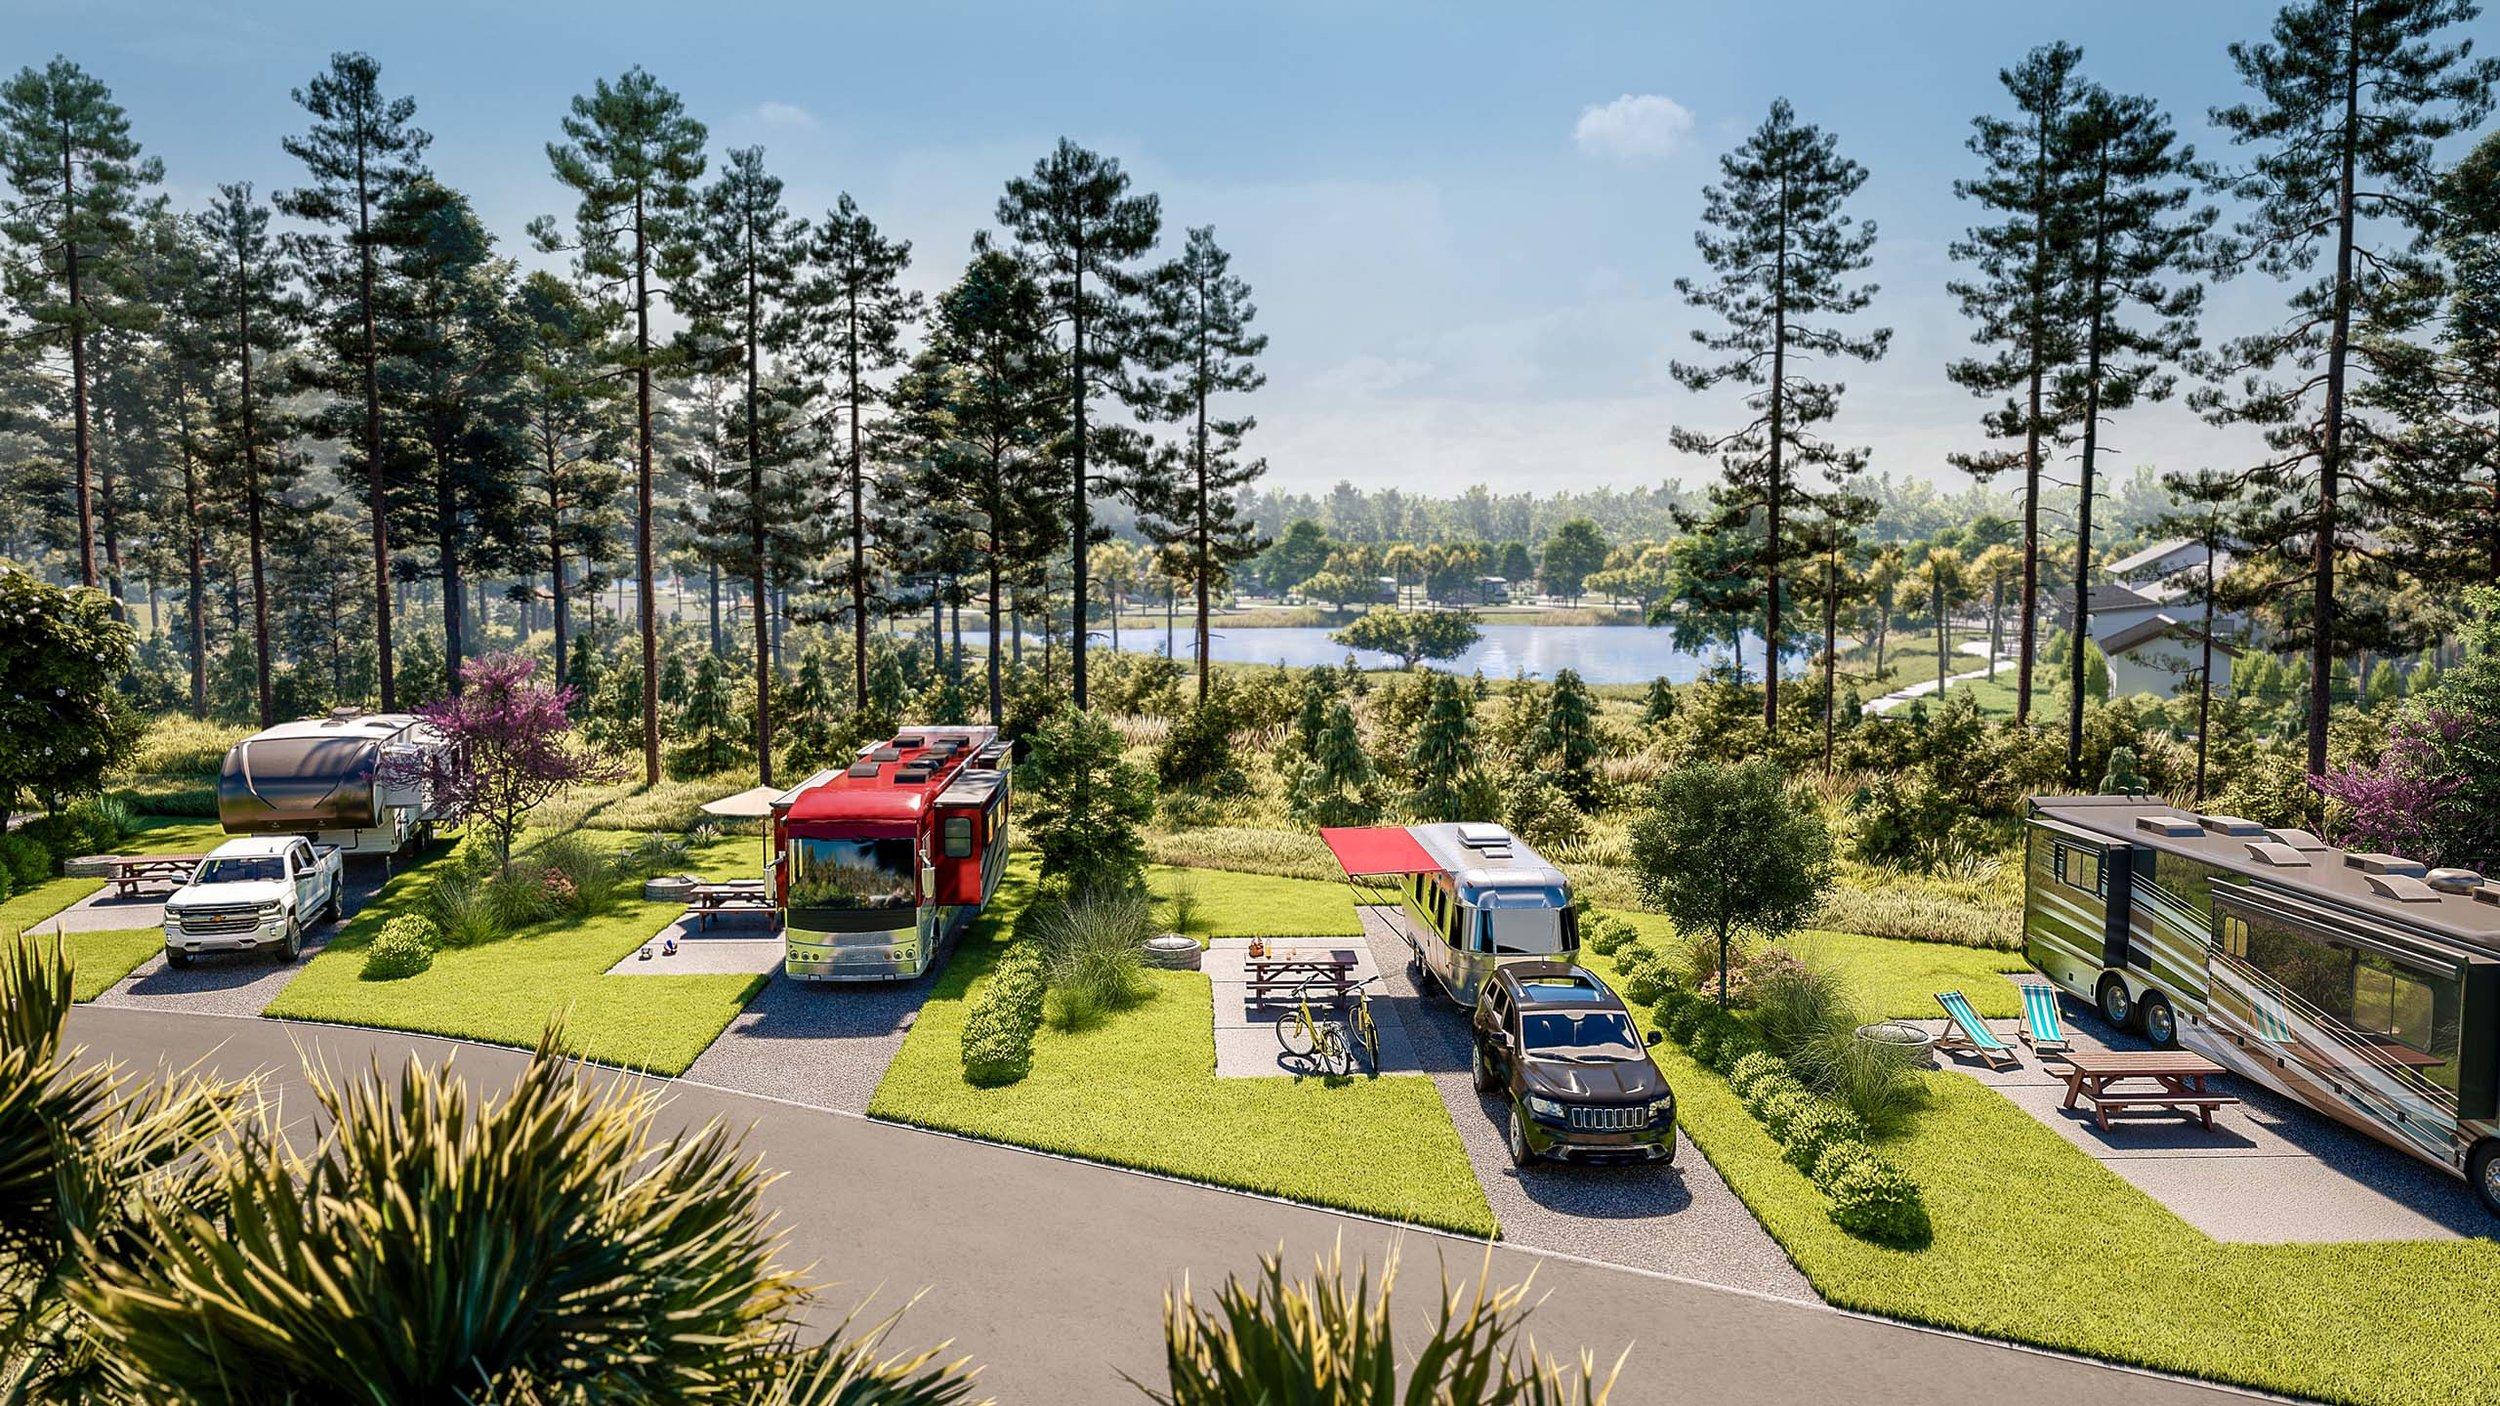 RVs at Carolina Pines, by TEN OVER MEDIA.